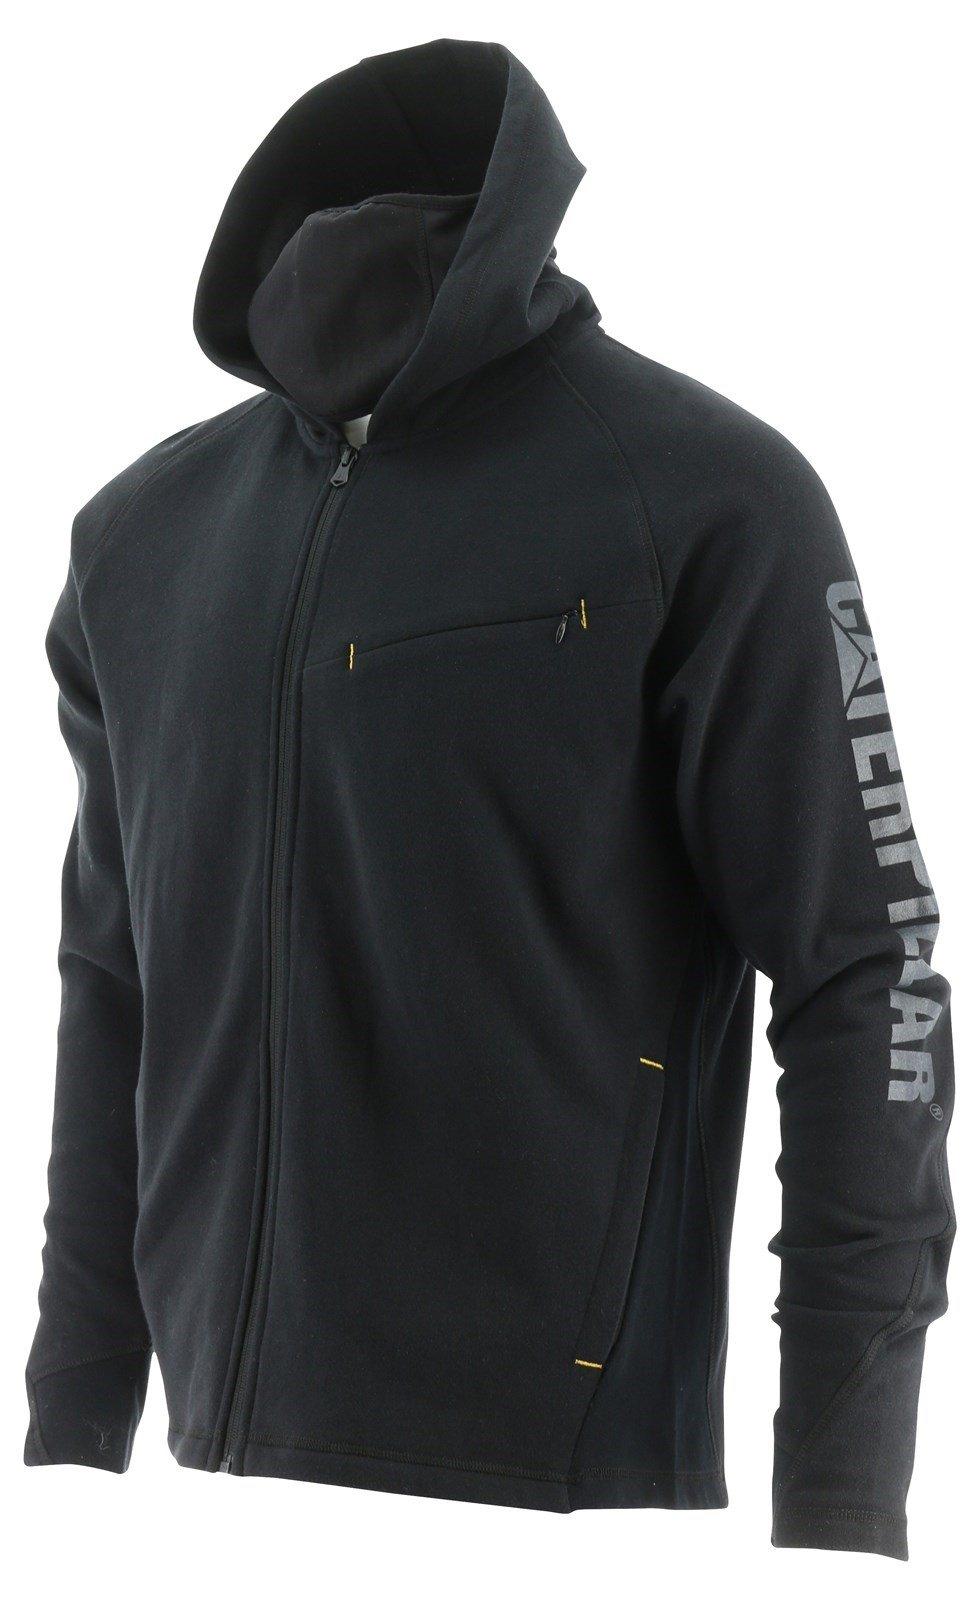 Caterpillar Unisex Viraloff Hooded Sweatshirt Black 32506 - Black Sml